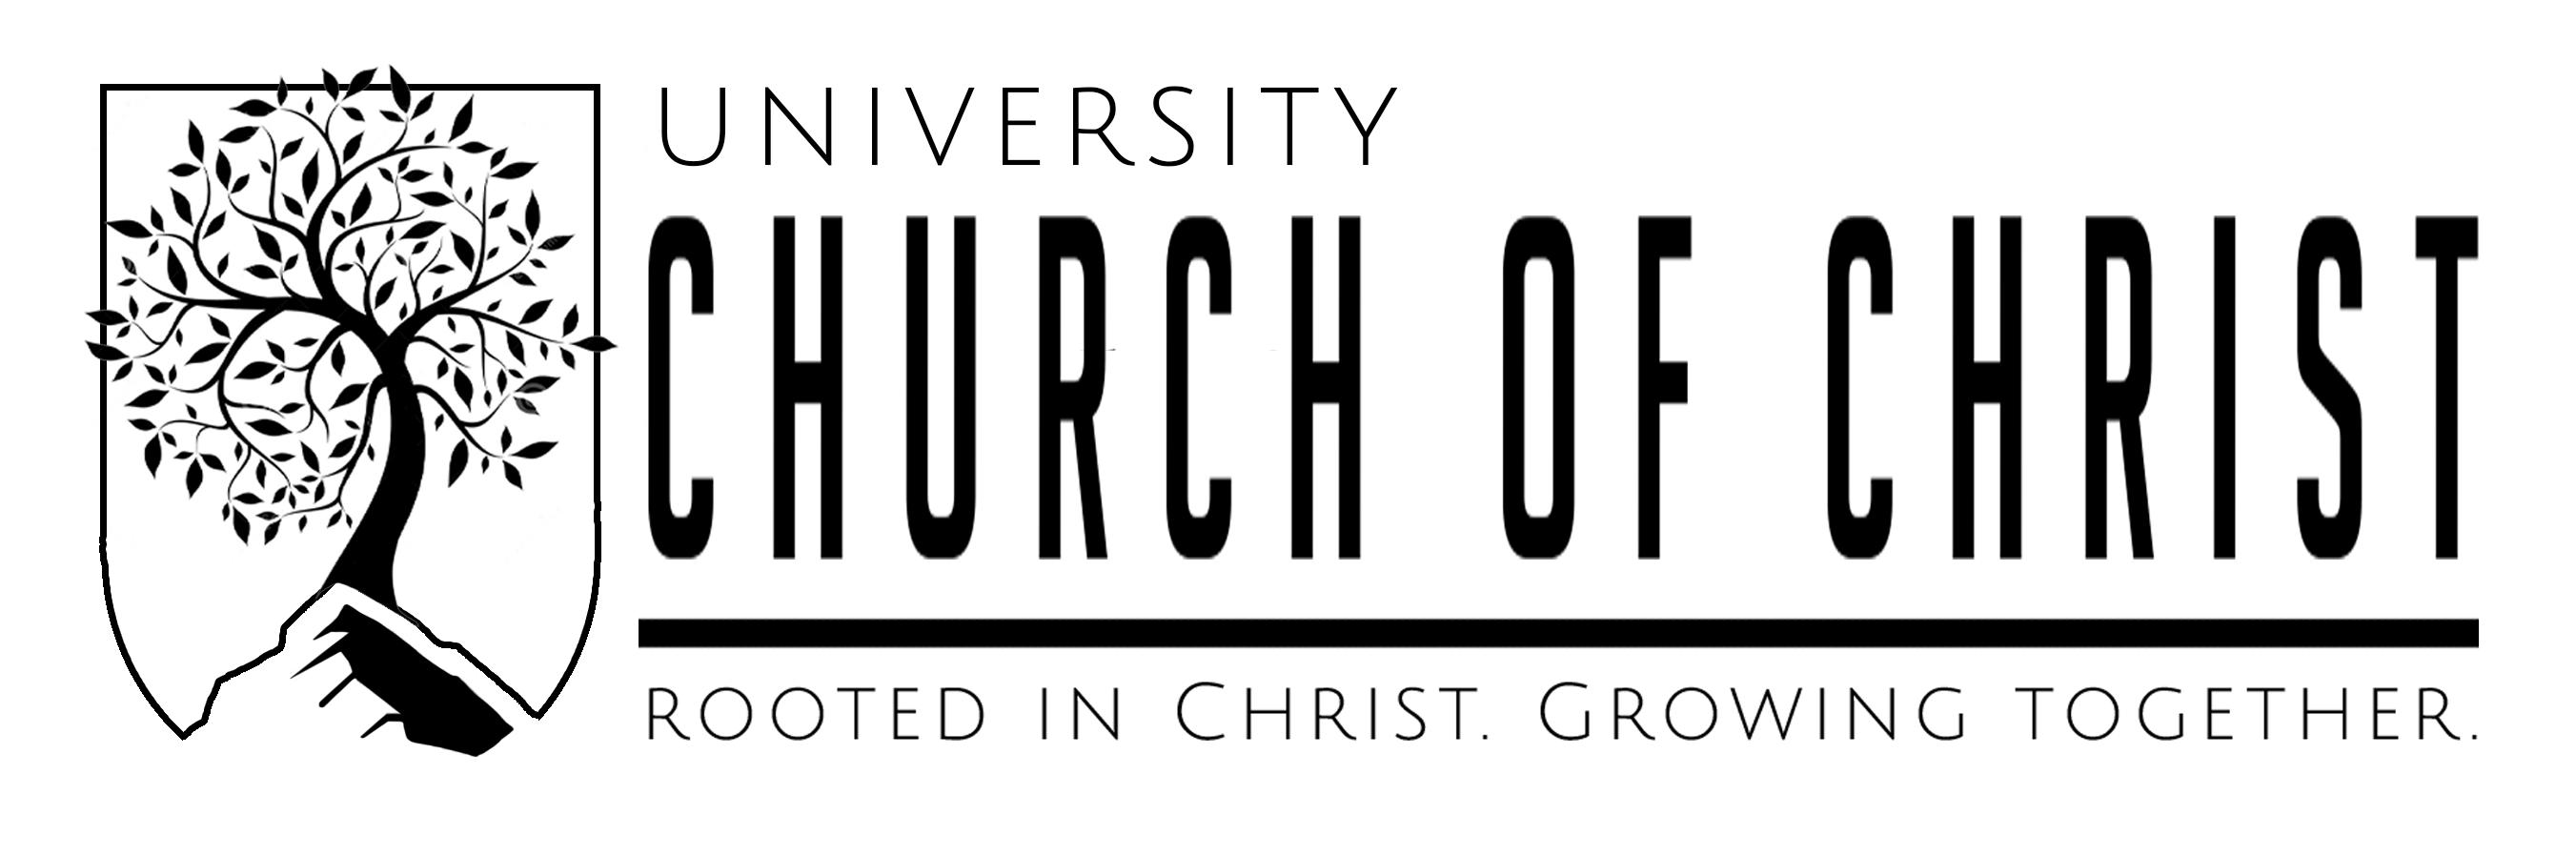 University Church of Christ